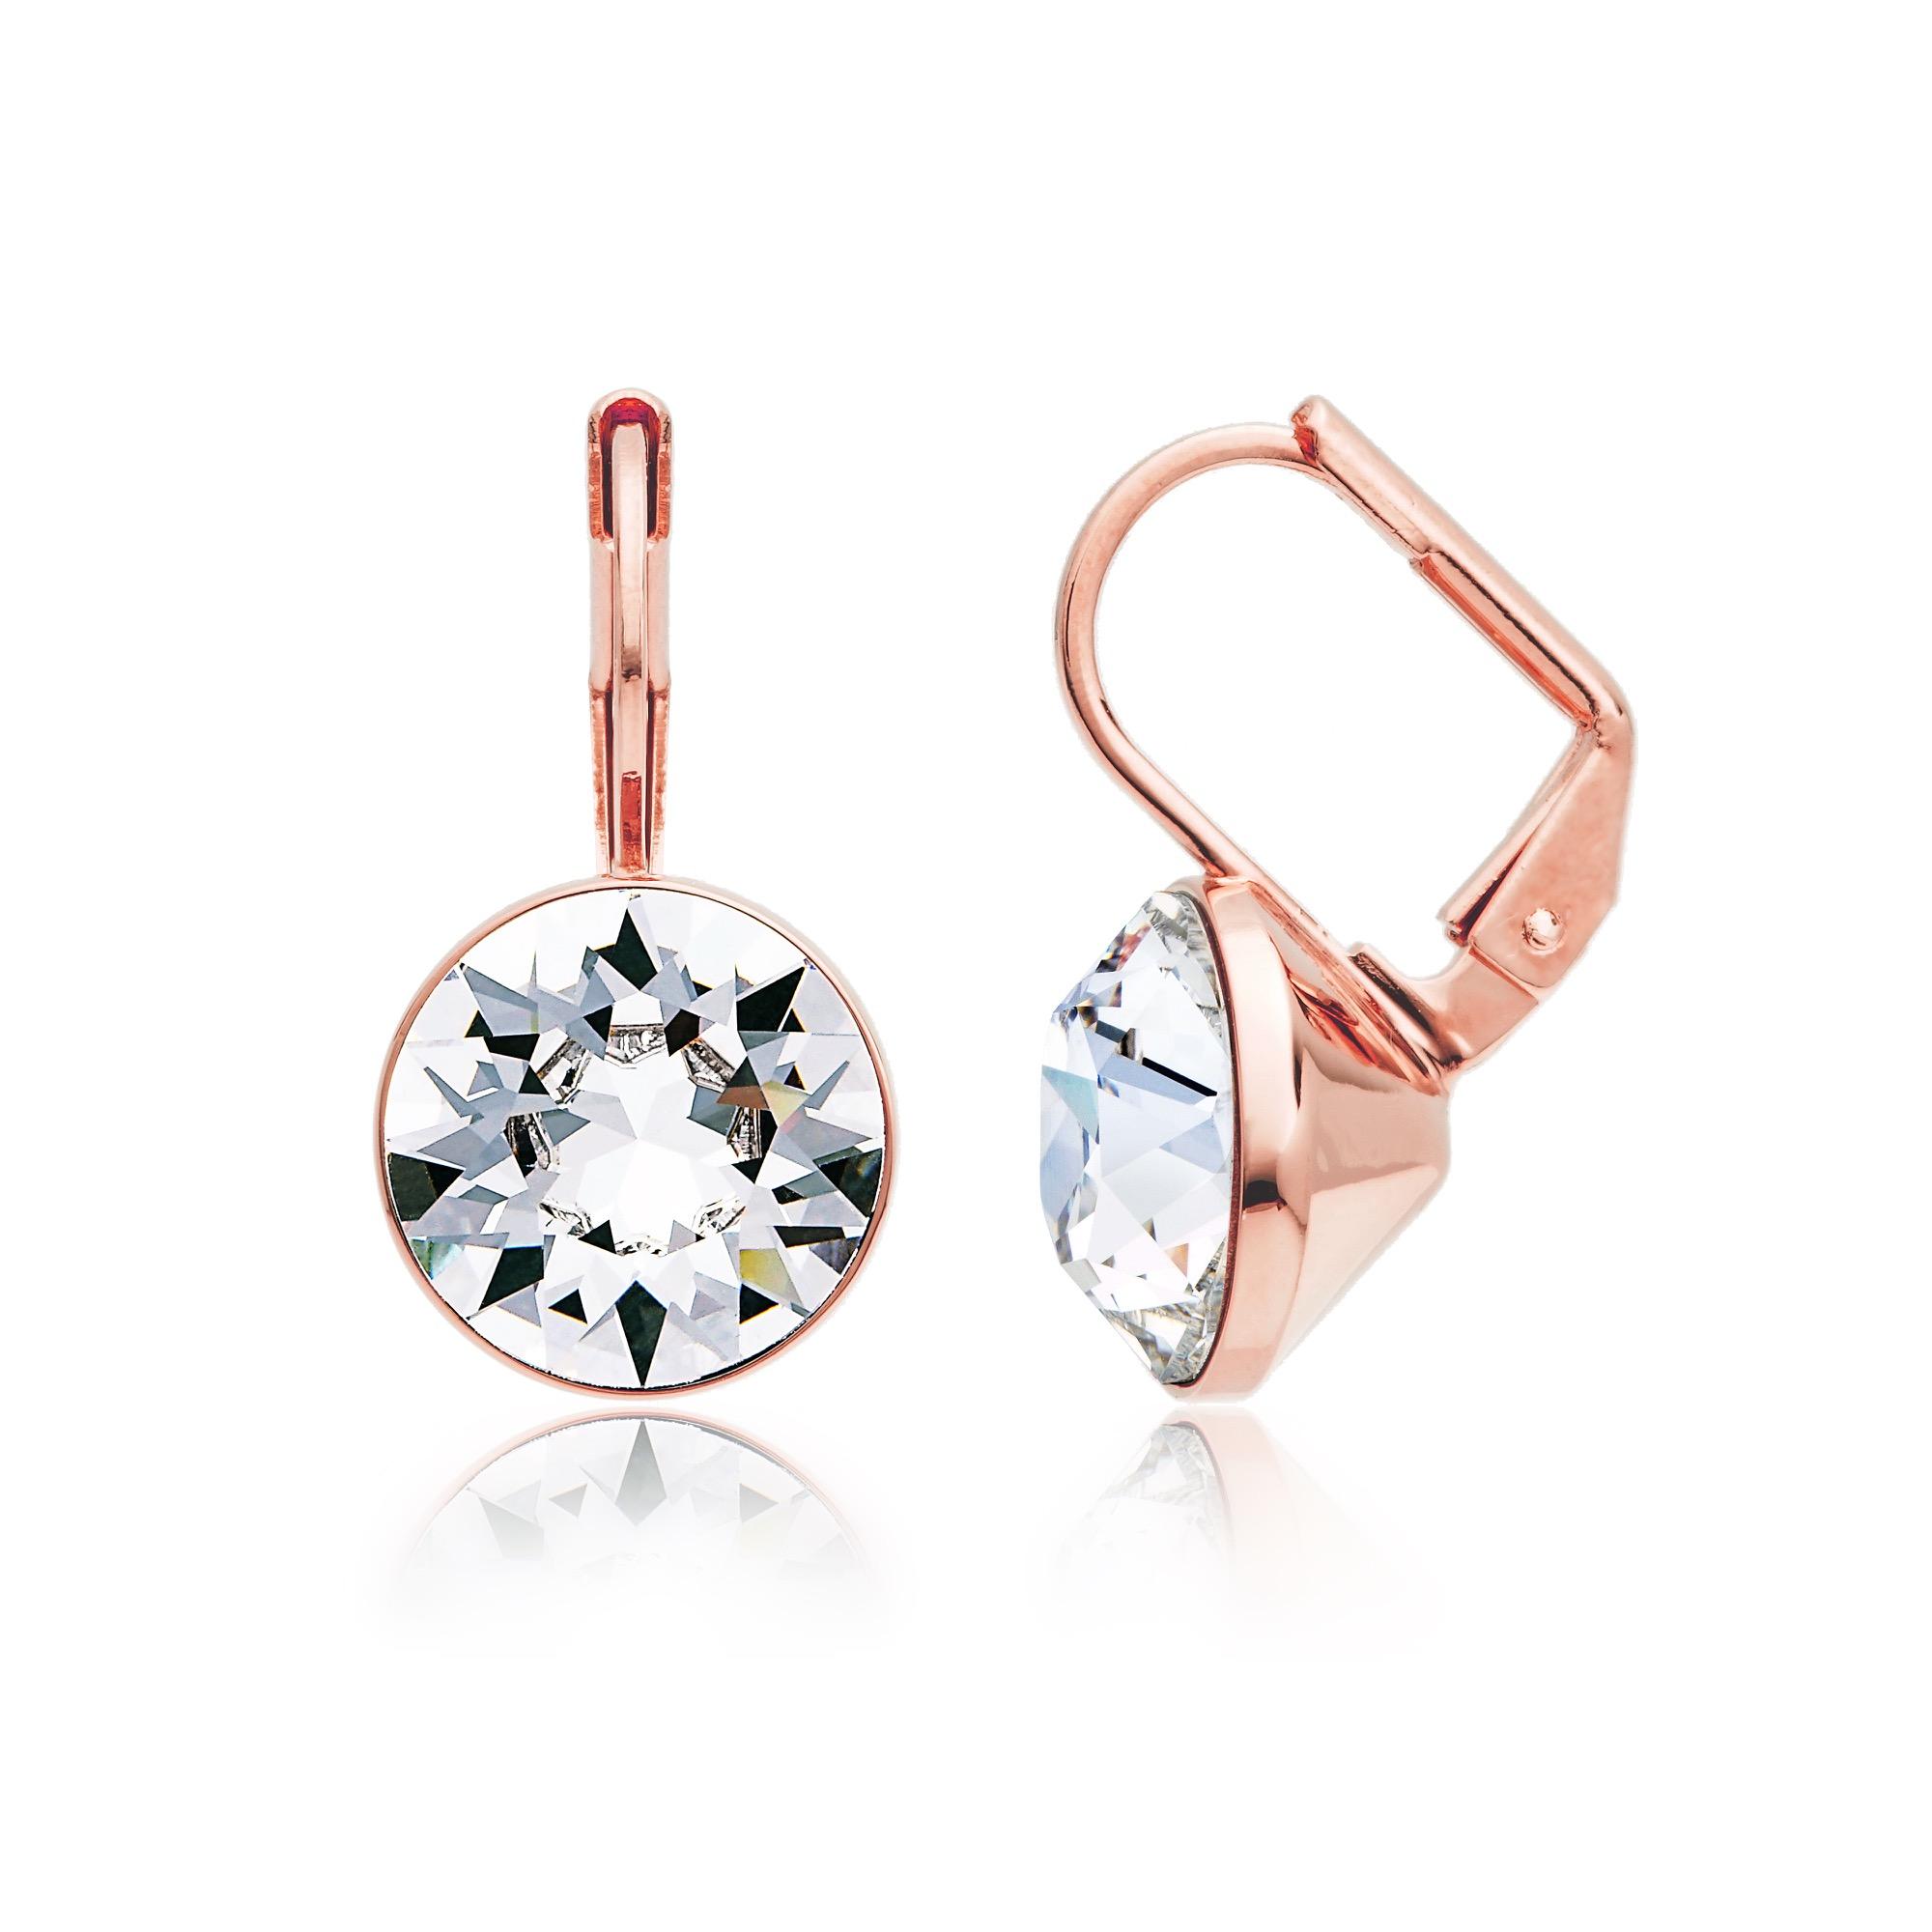 MYJS Bella Statement Earrings Clear Swarovski Crystal Rose Gold Plated AxdQB5IxX